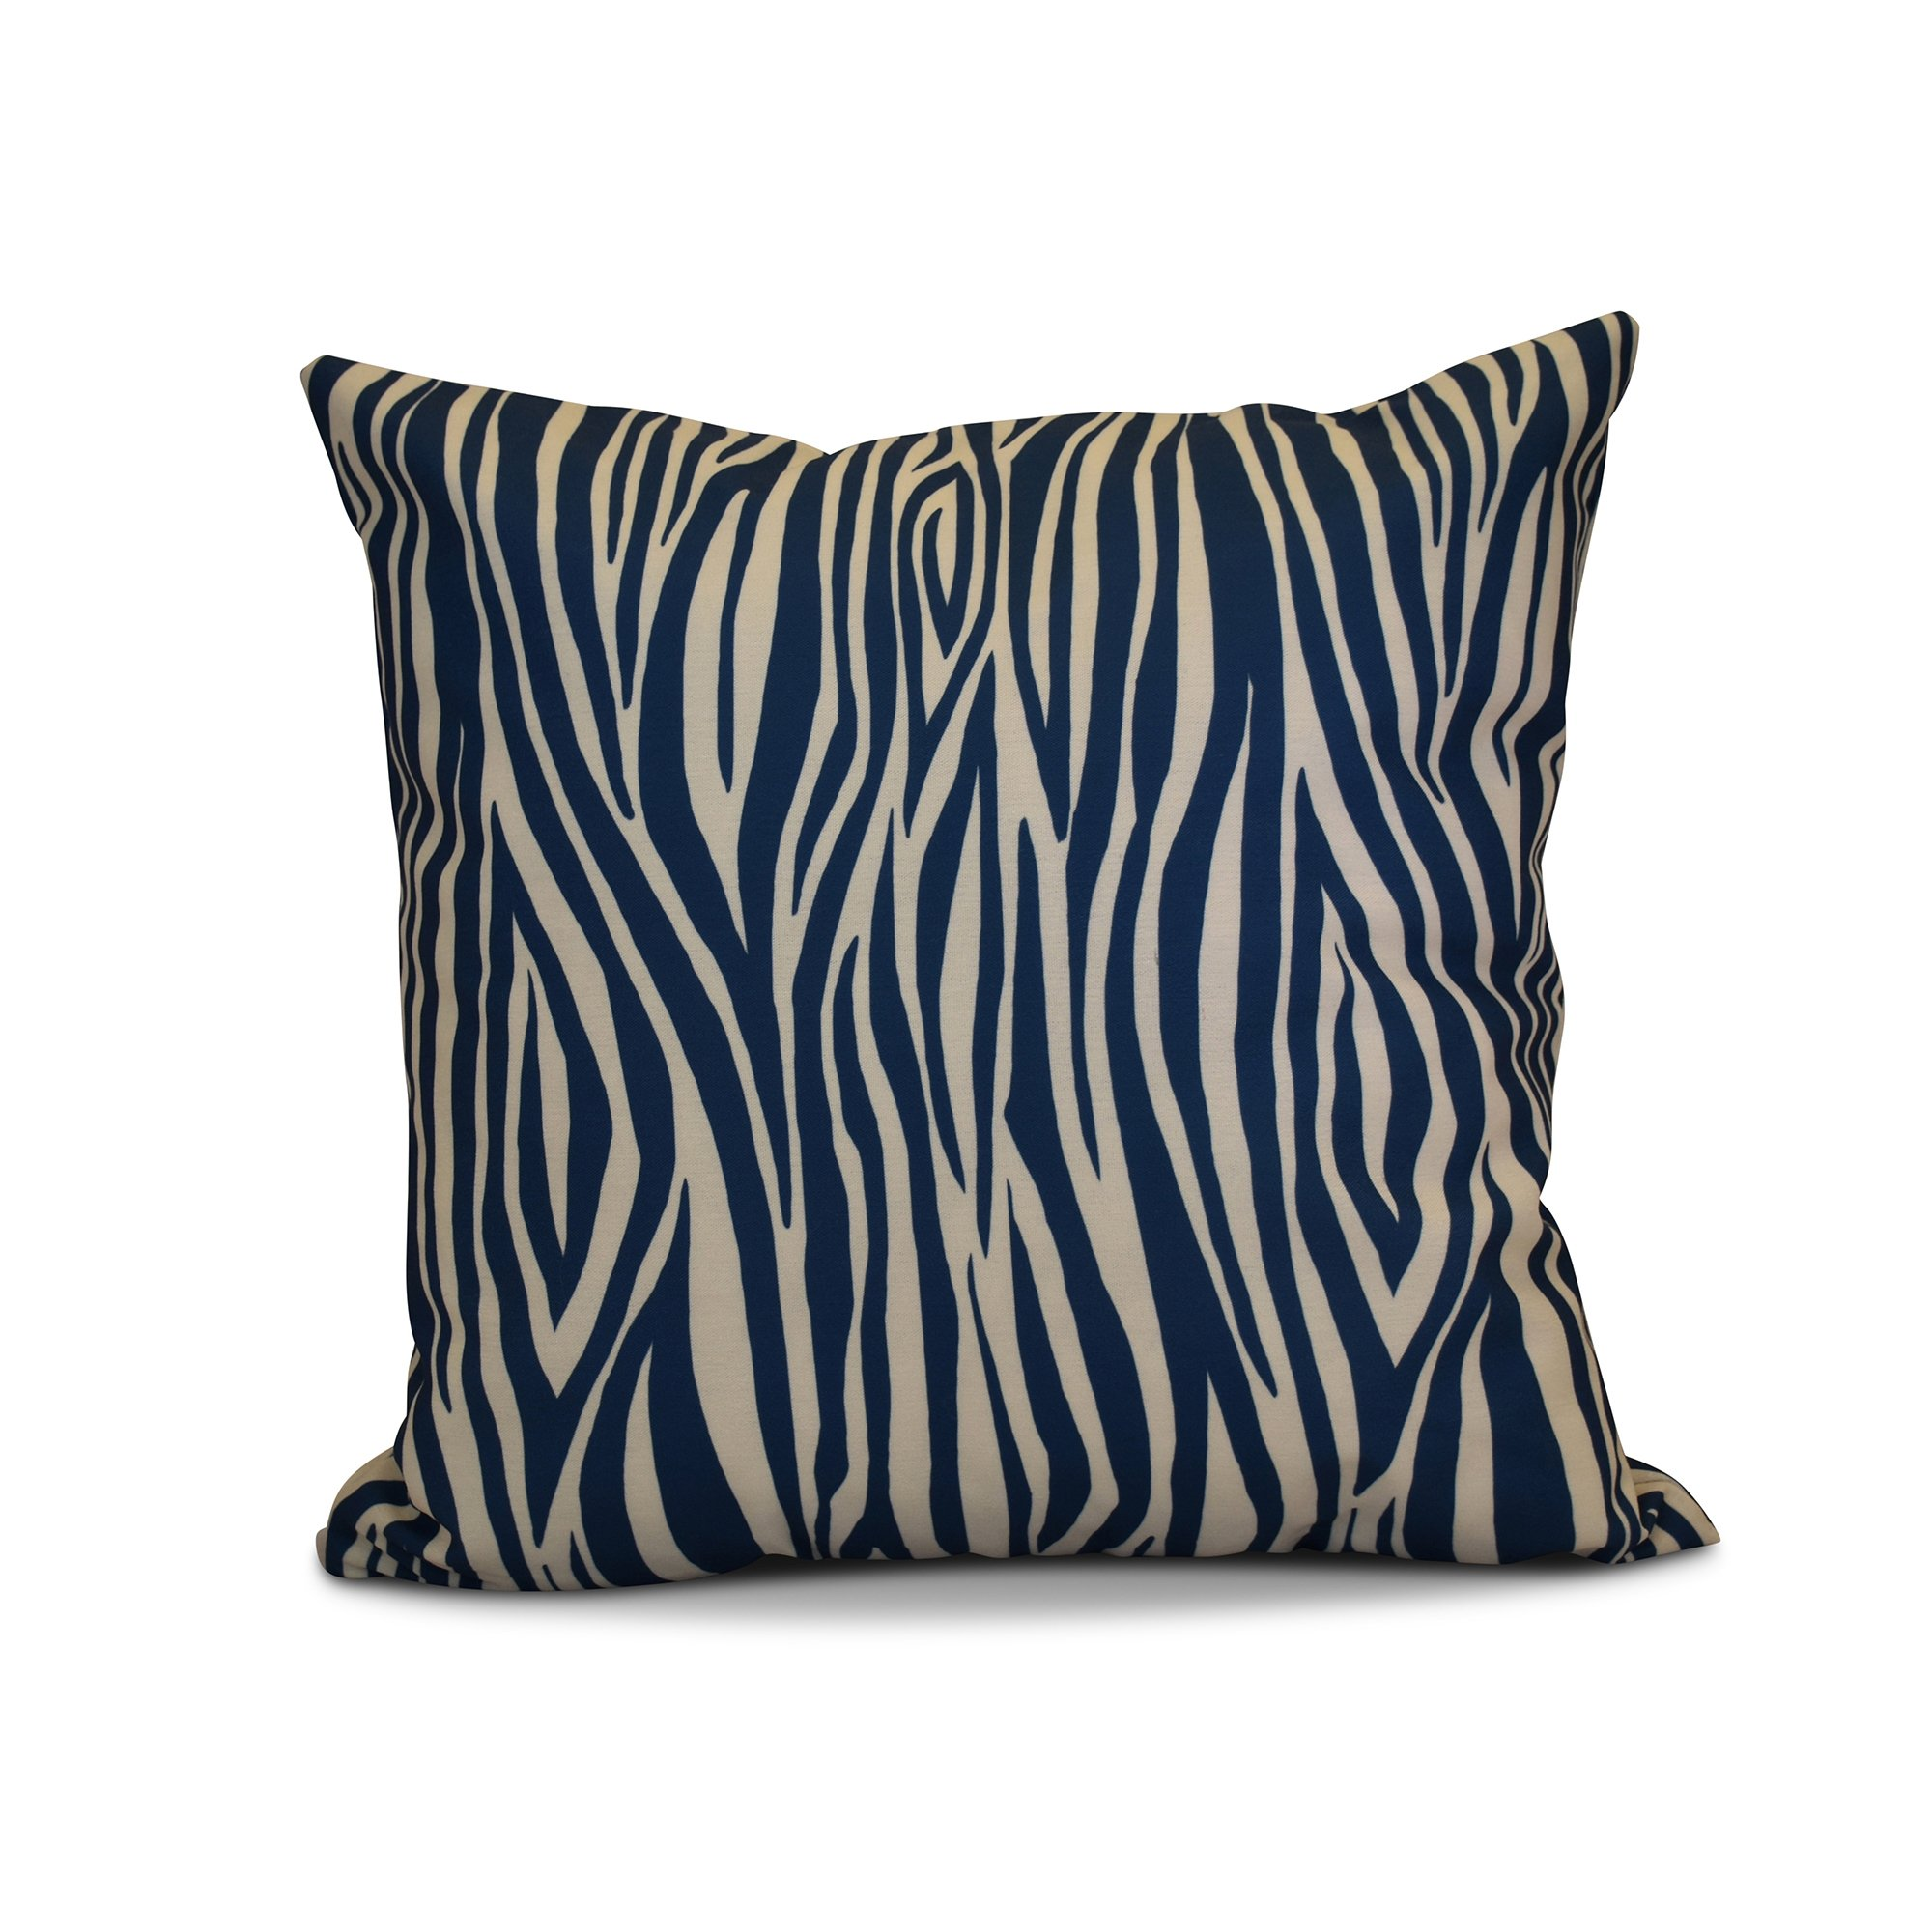 E by design 26 x 26-inch, Wood Stripe, Geometric Print Pillow, Navy Blue